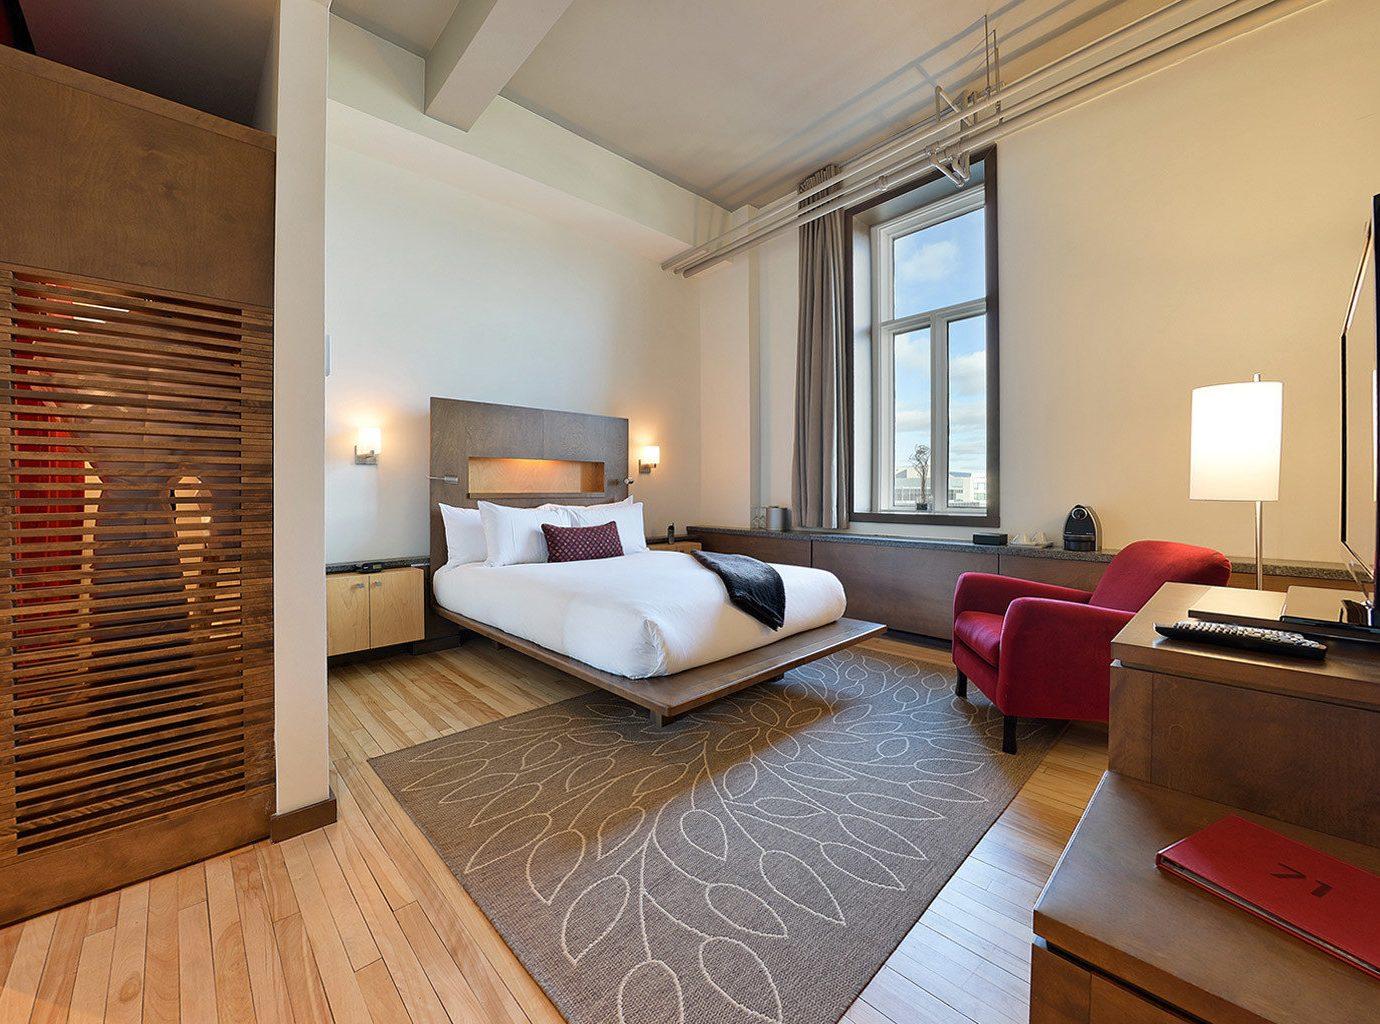 Hotel 71 Quebec City